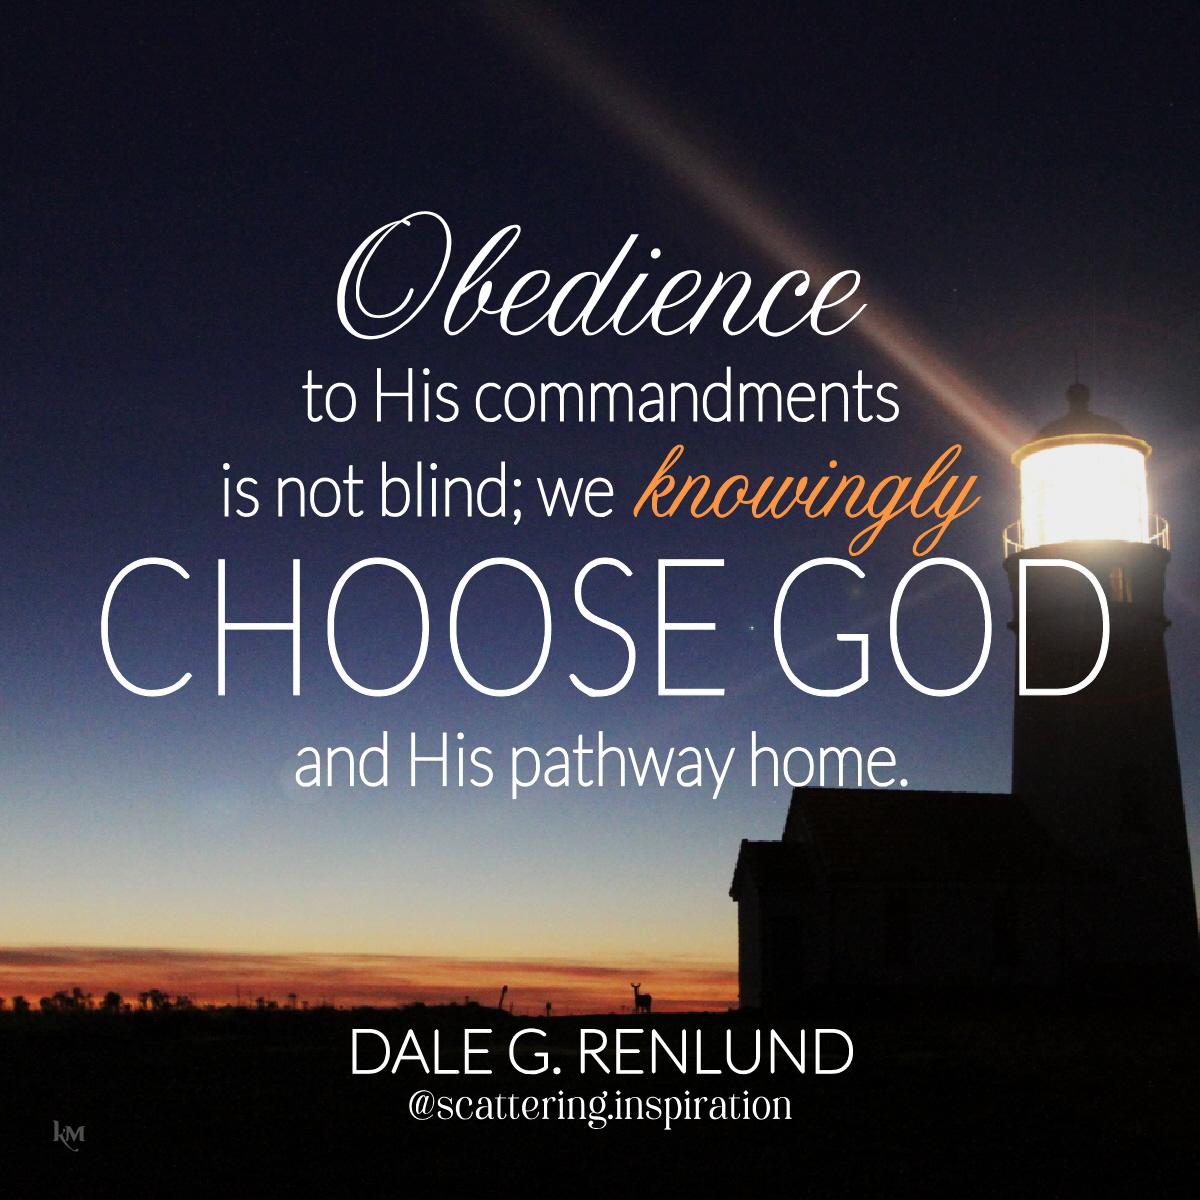 we knowingly choose God